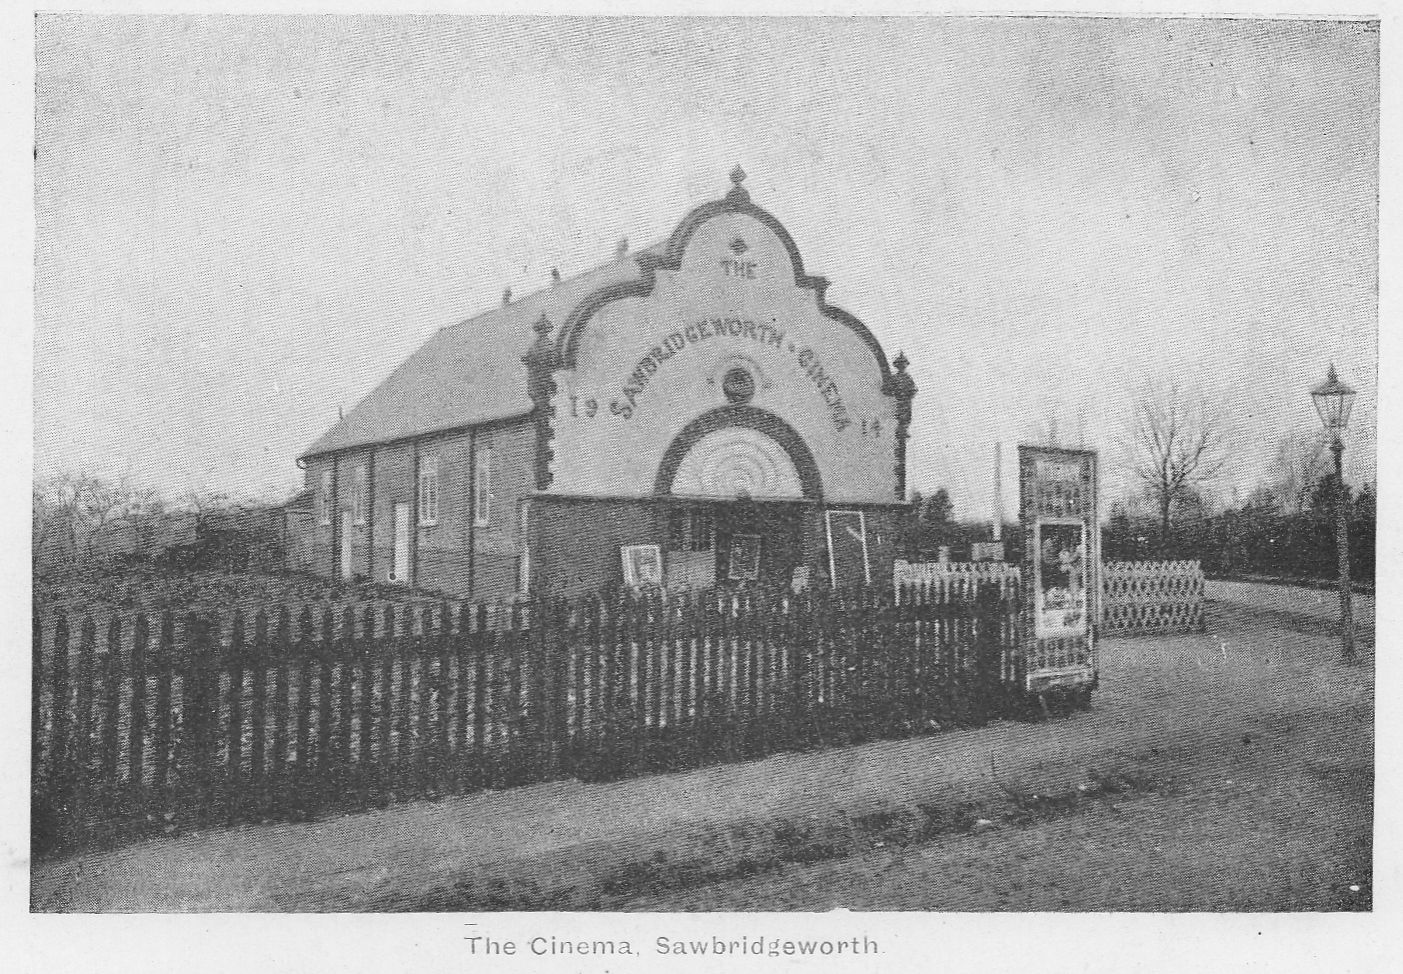 SBW Cinema opened in 1914